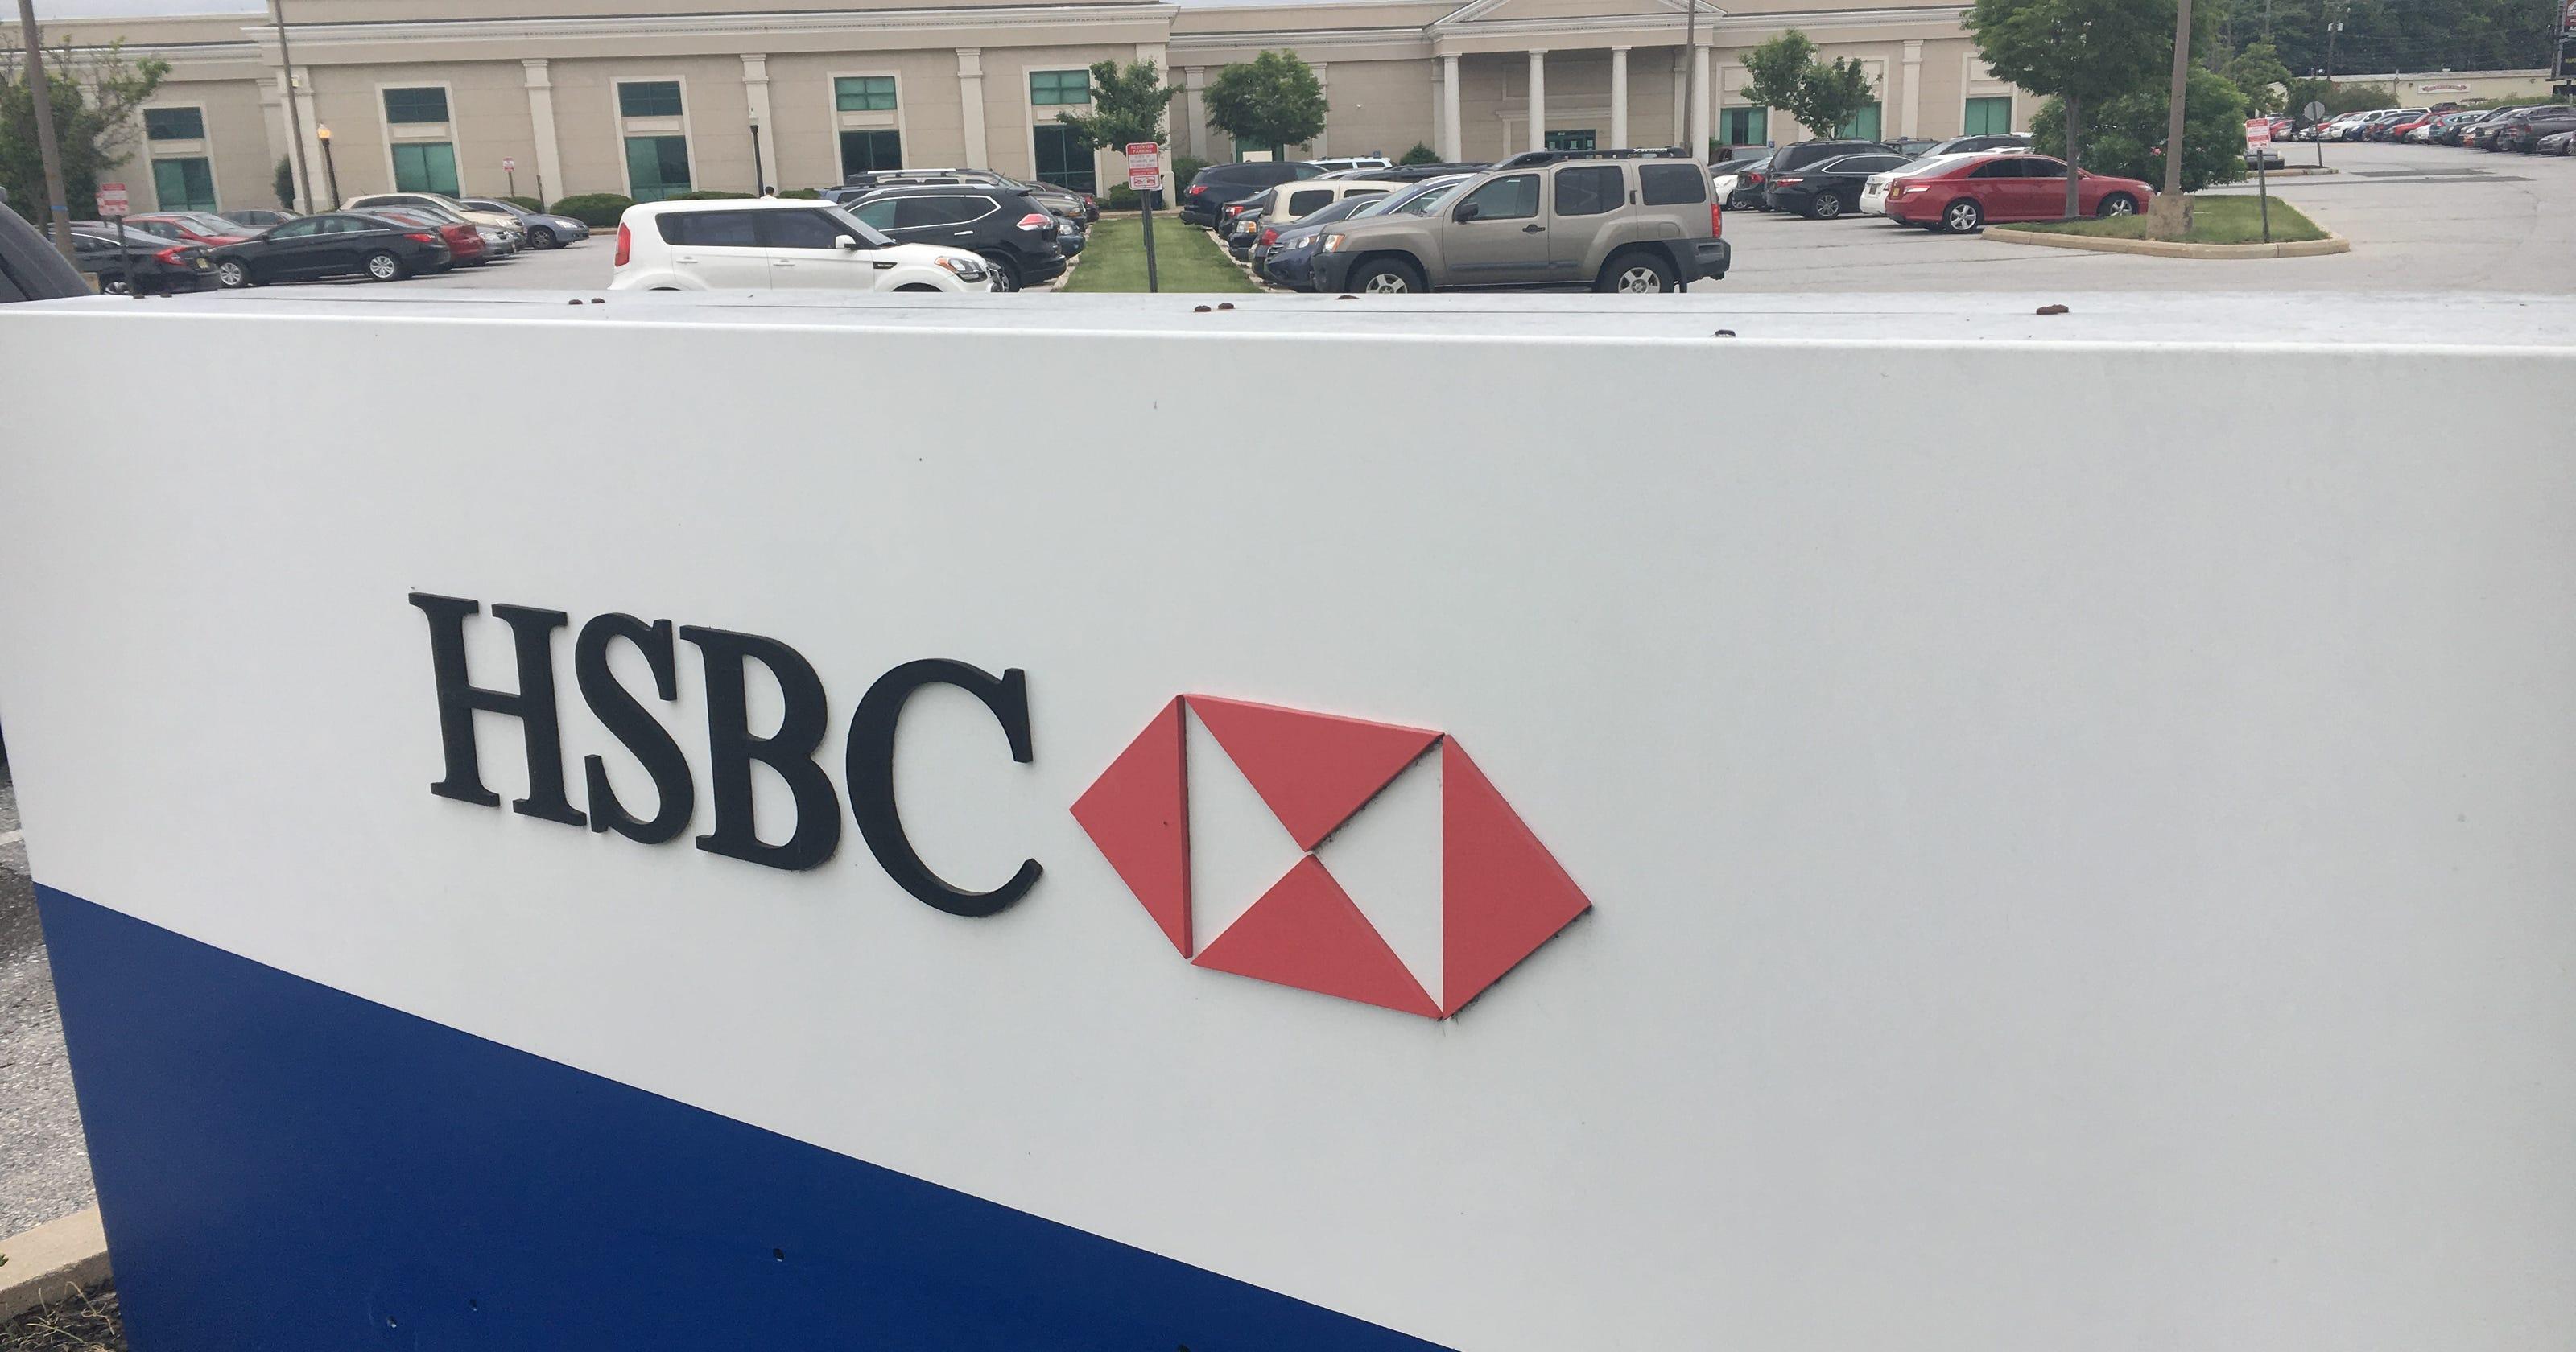 HSBC to close New Castle center, move 450 jobs